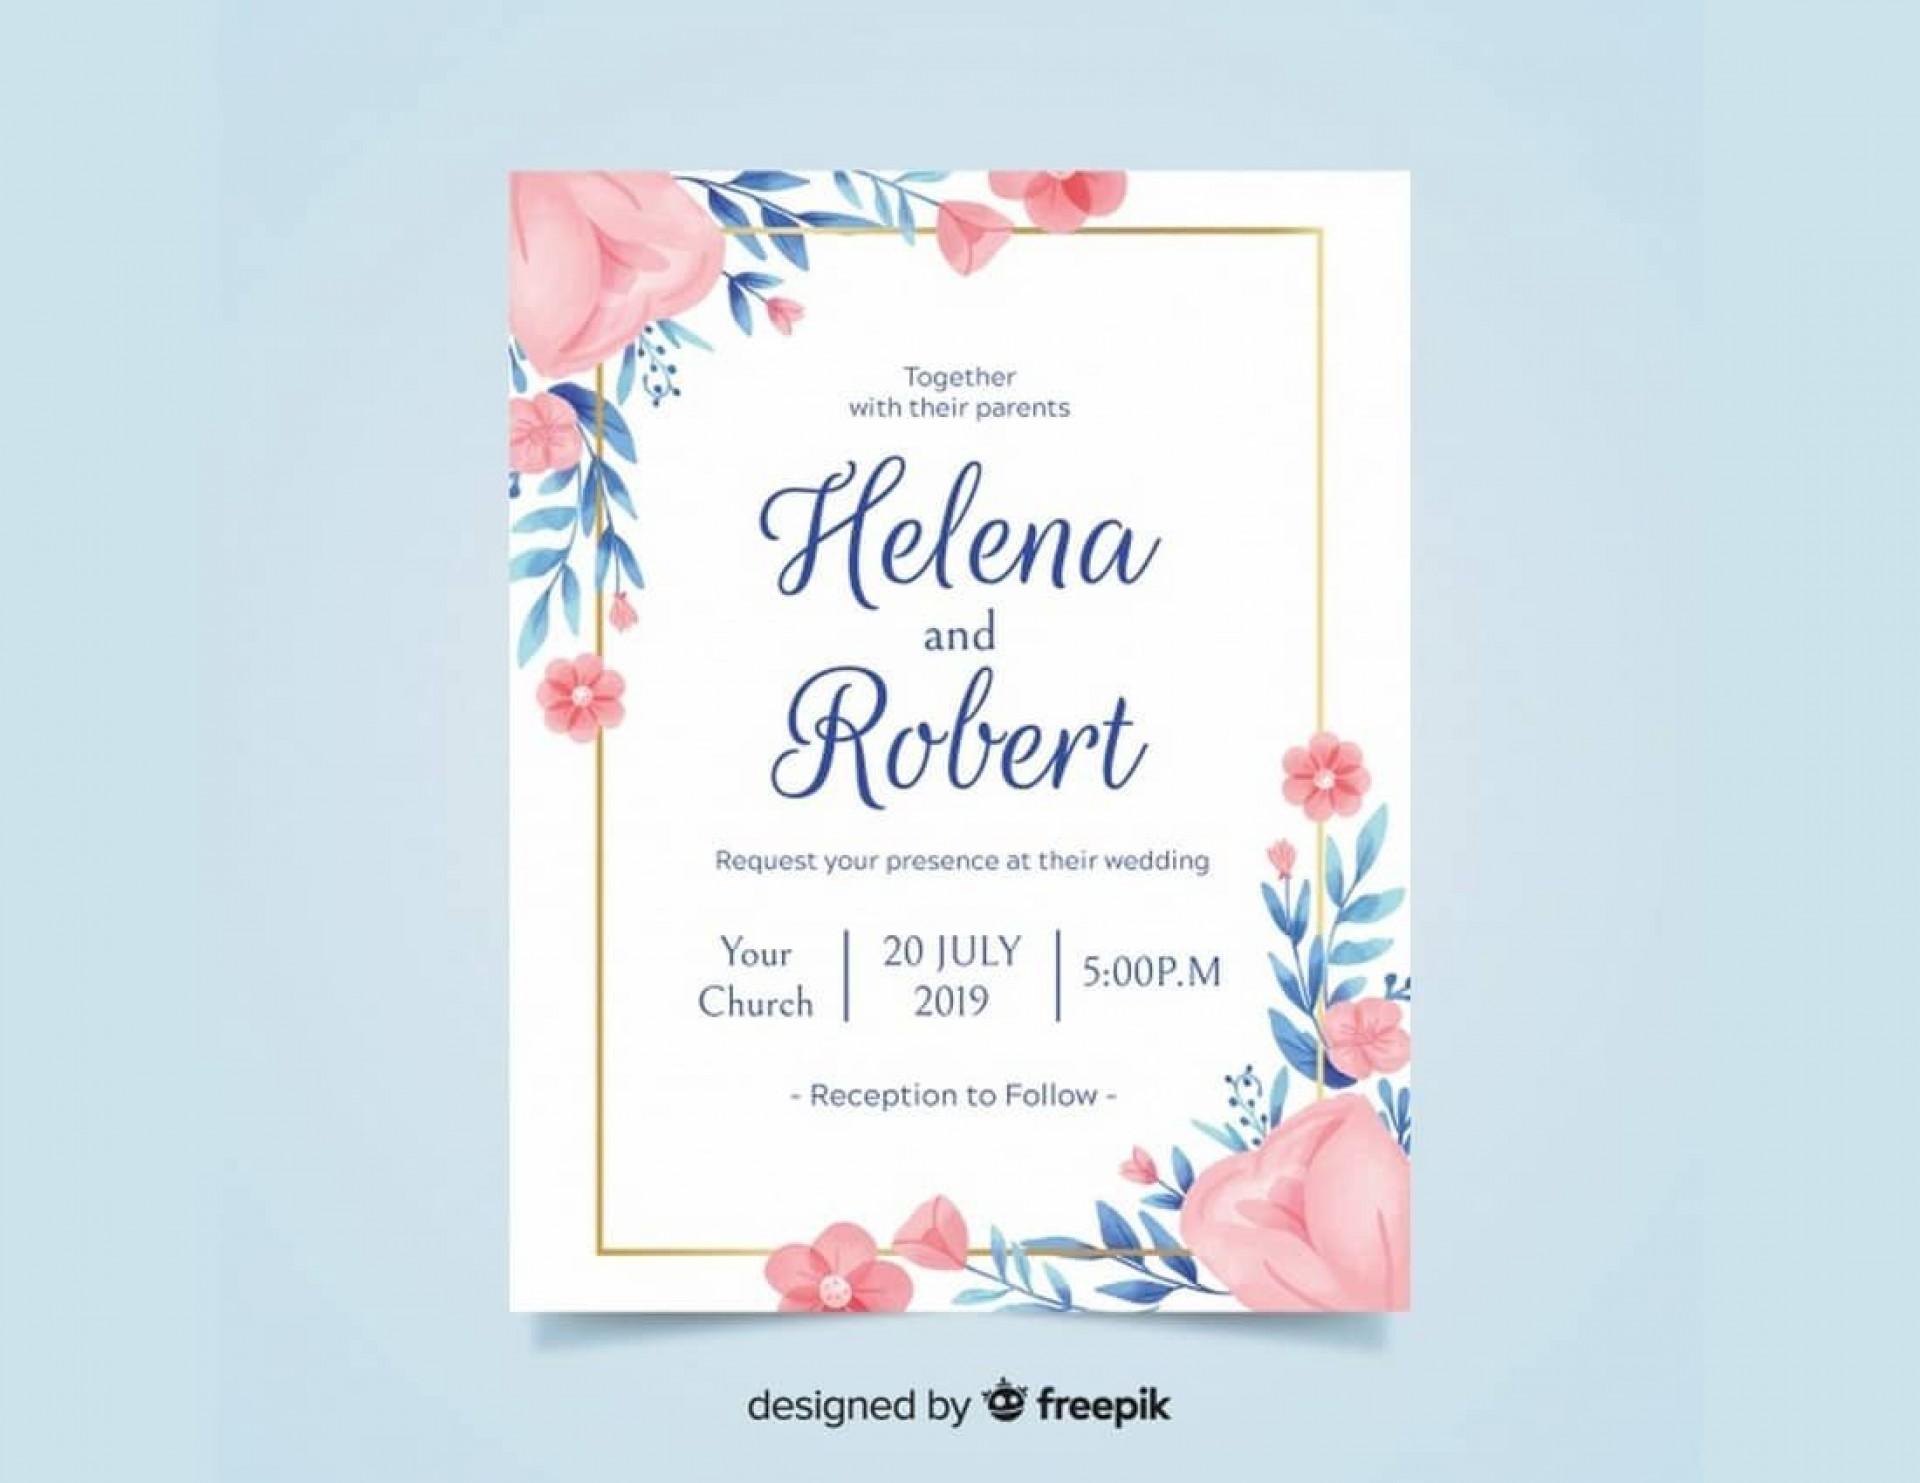 007 Surprising Microsoft Word Wedding Invitation Template Free Download Highest Clarity  M Editable1920